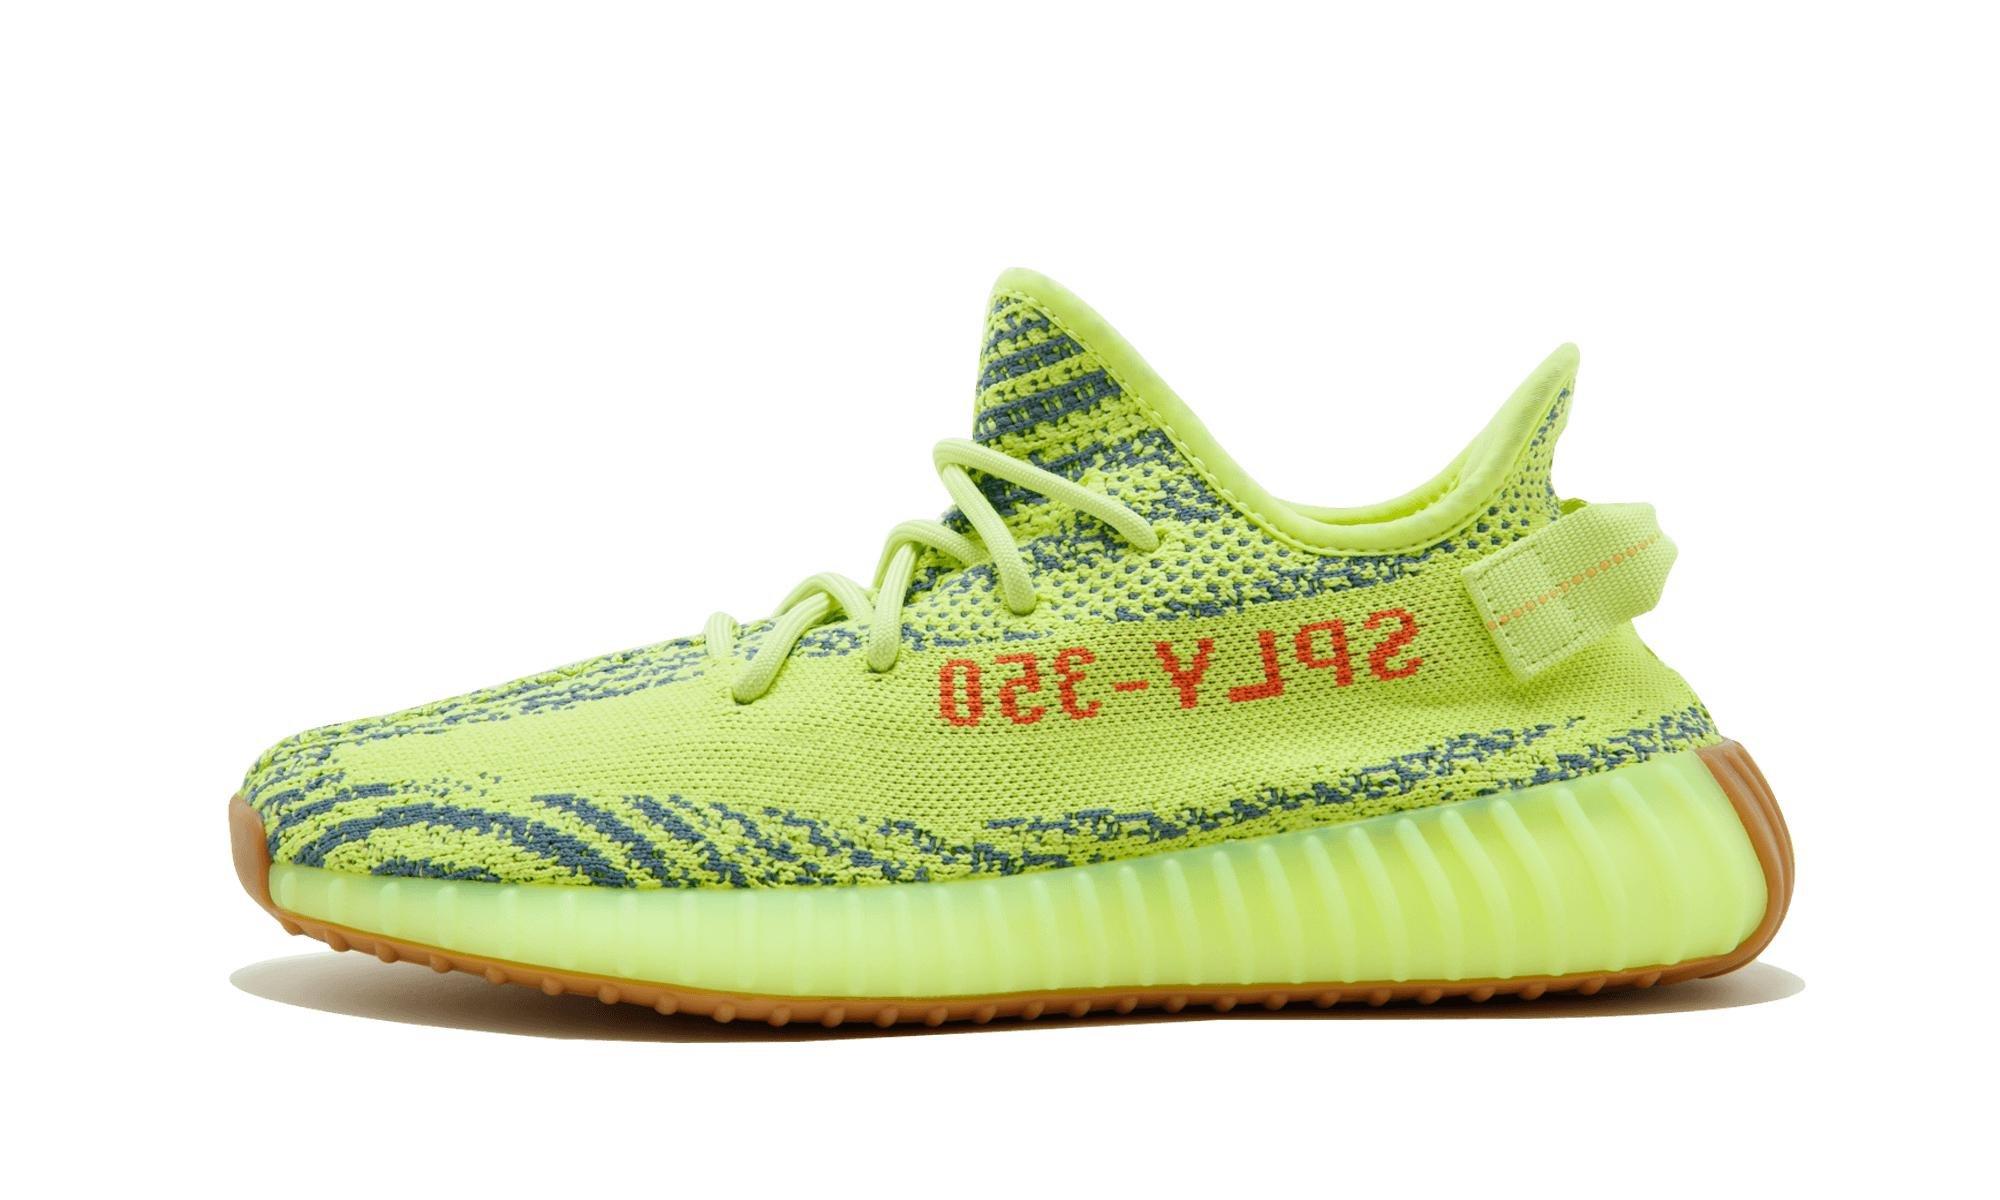 lyst adidas yeezy impulso 350 v2 in verde per gli uomini.